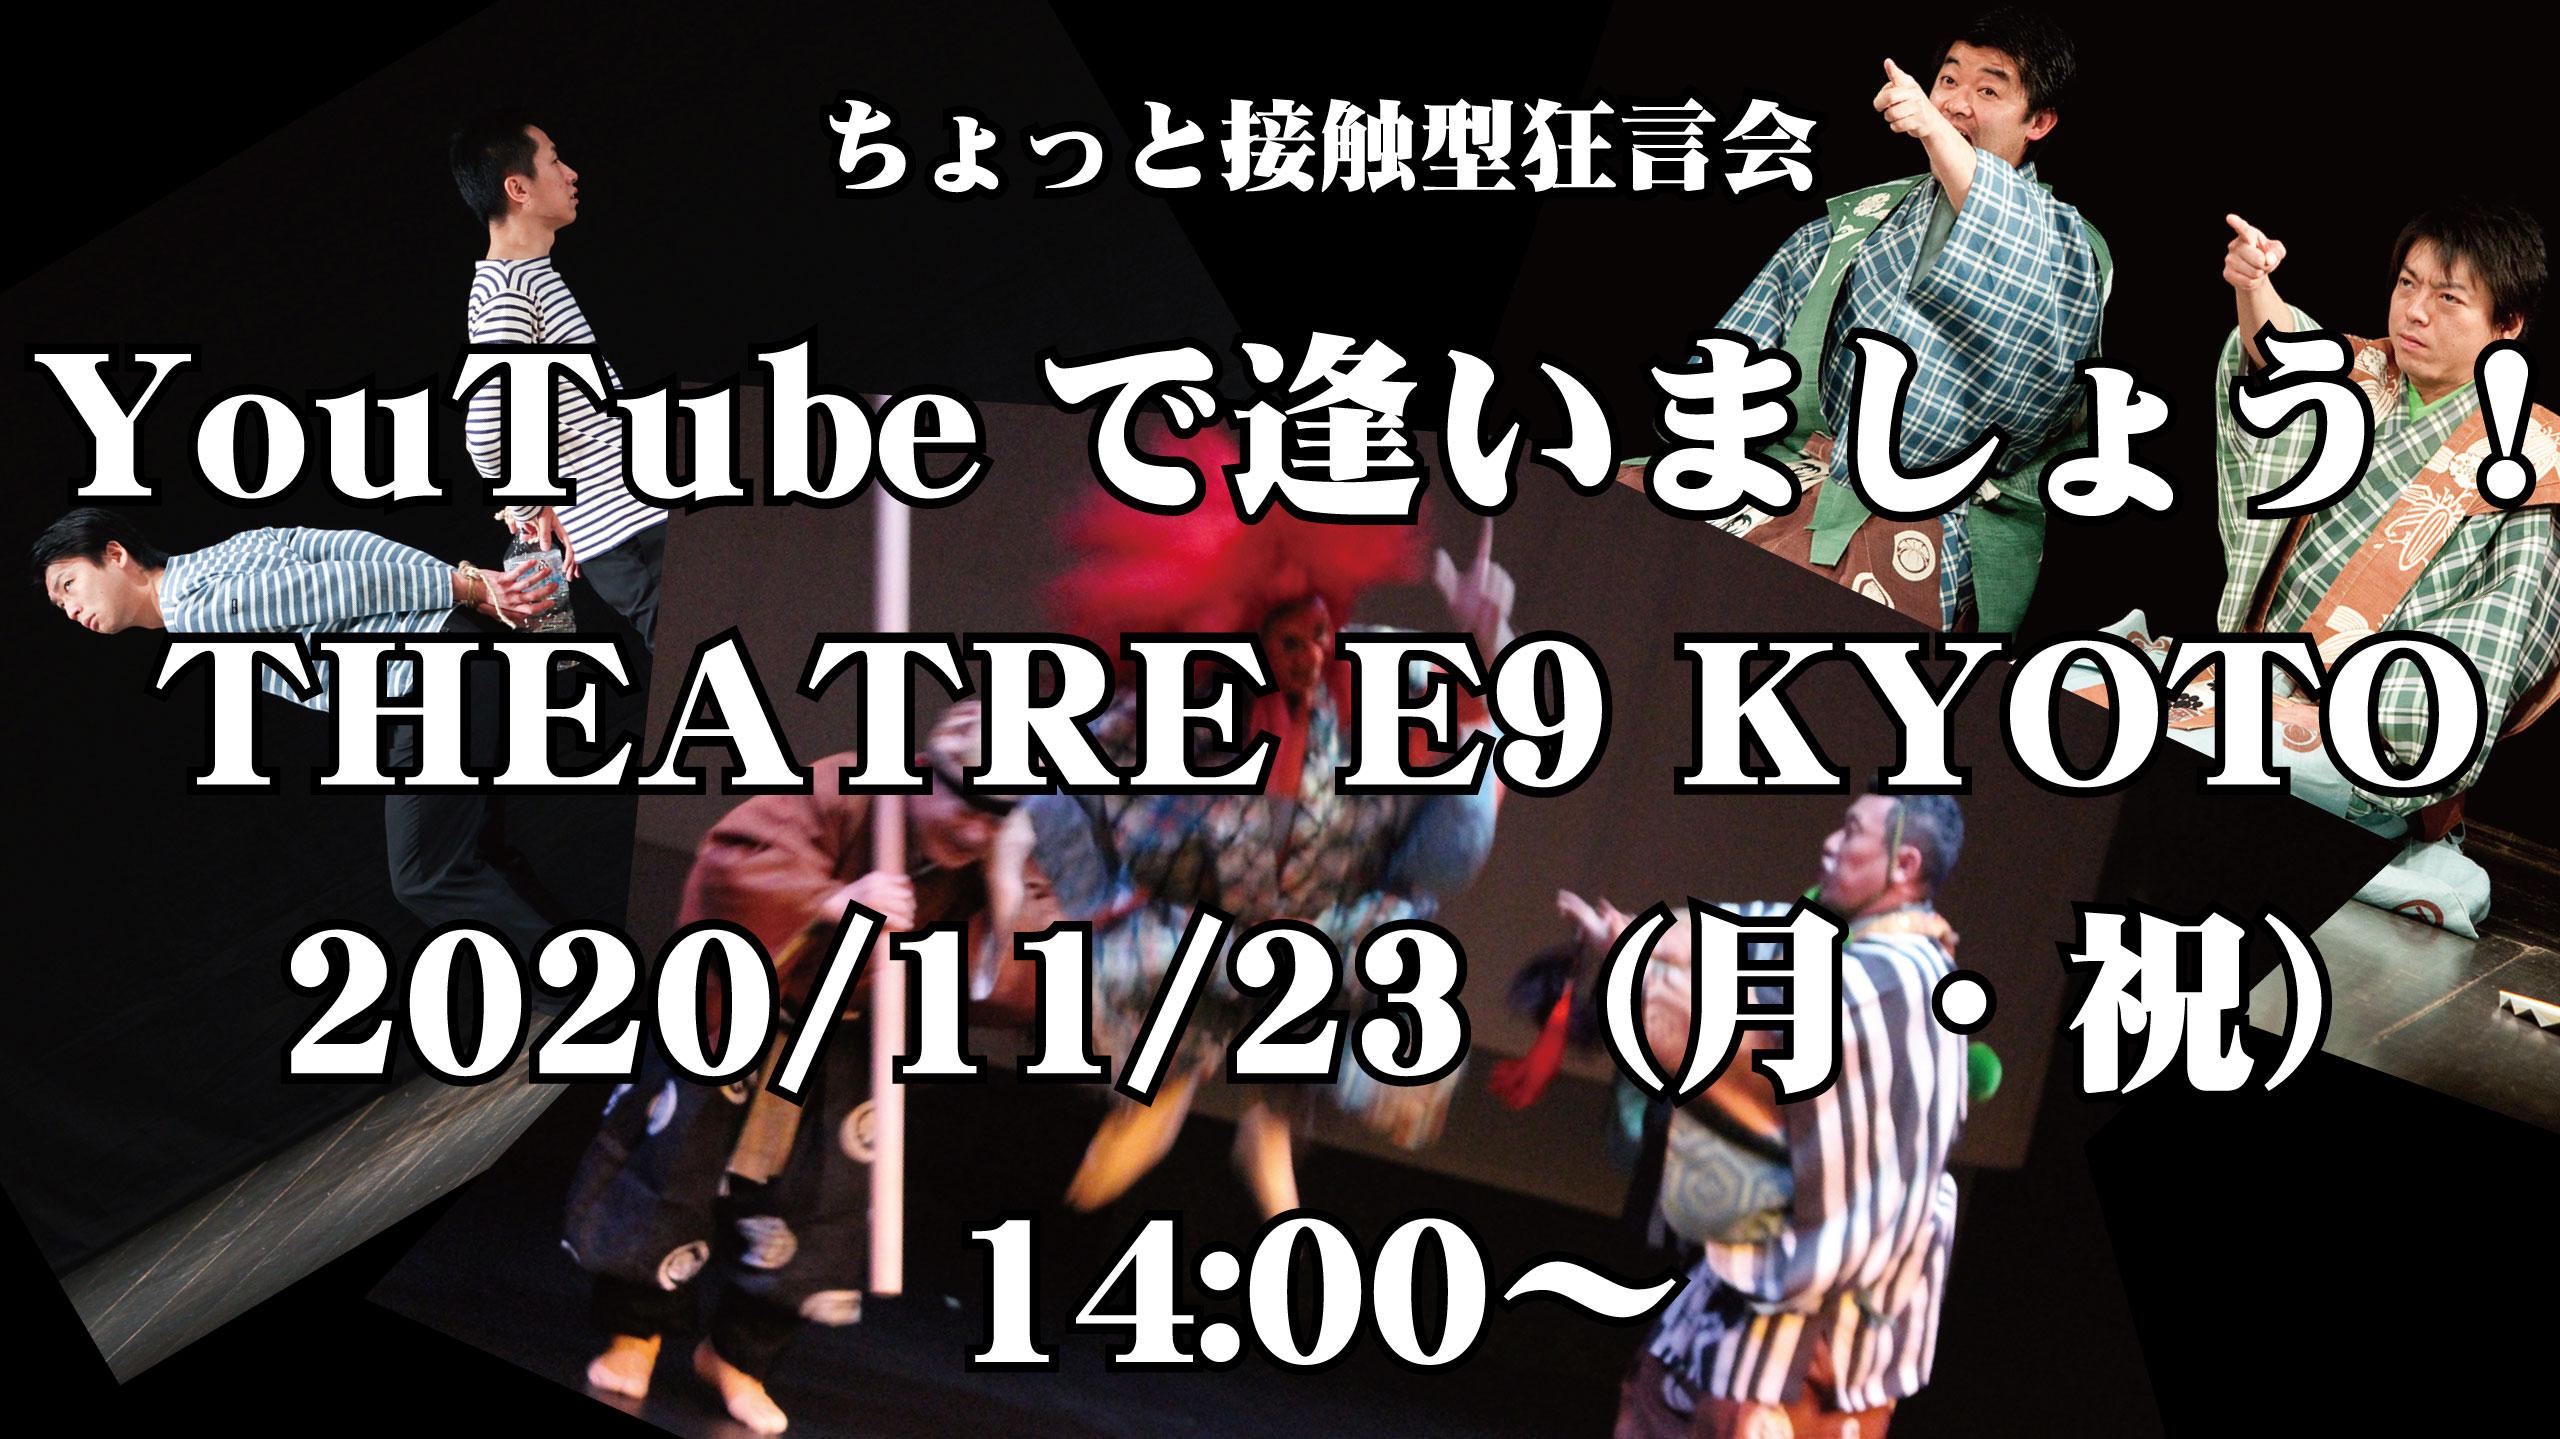 YouTubeで逢いましょう!〜THEATRE E9 KYOTO〜ライブ配信は11/23、14時から!